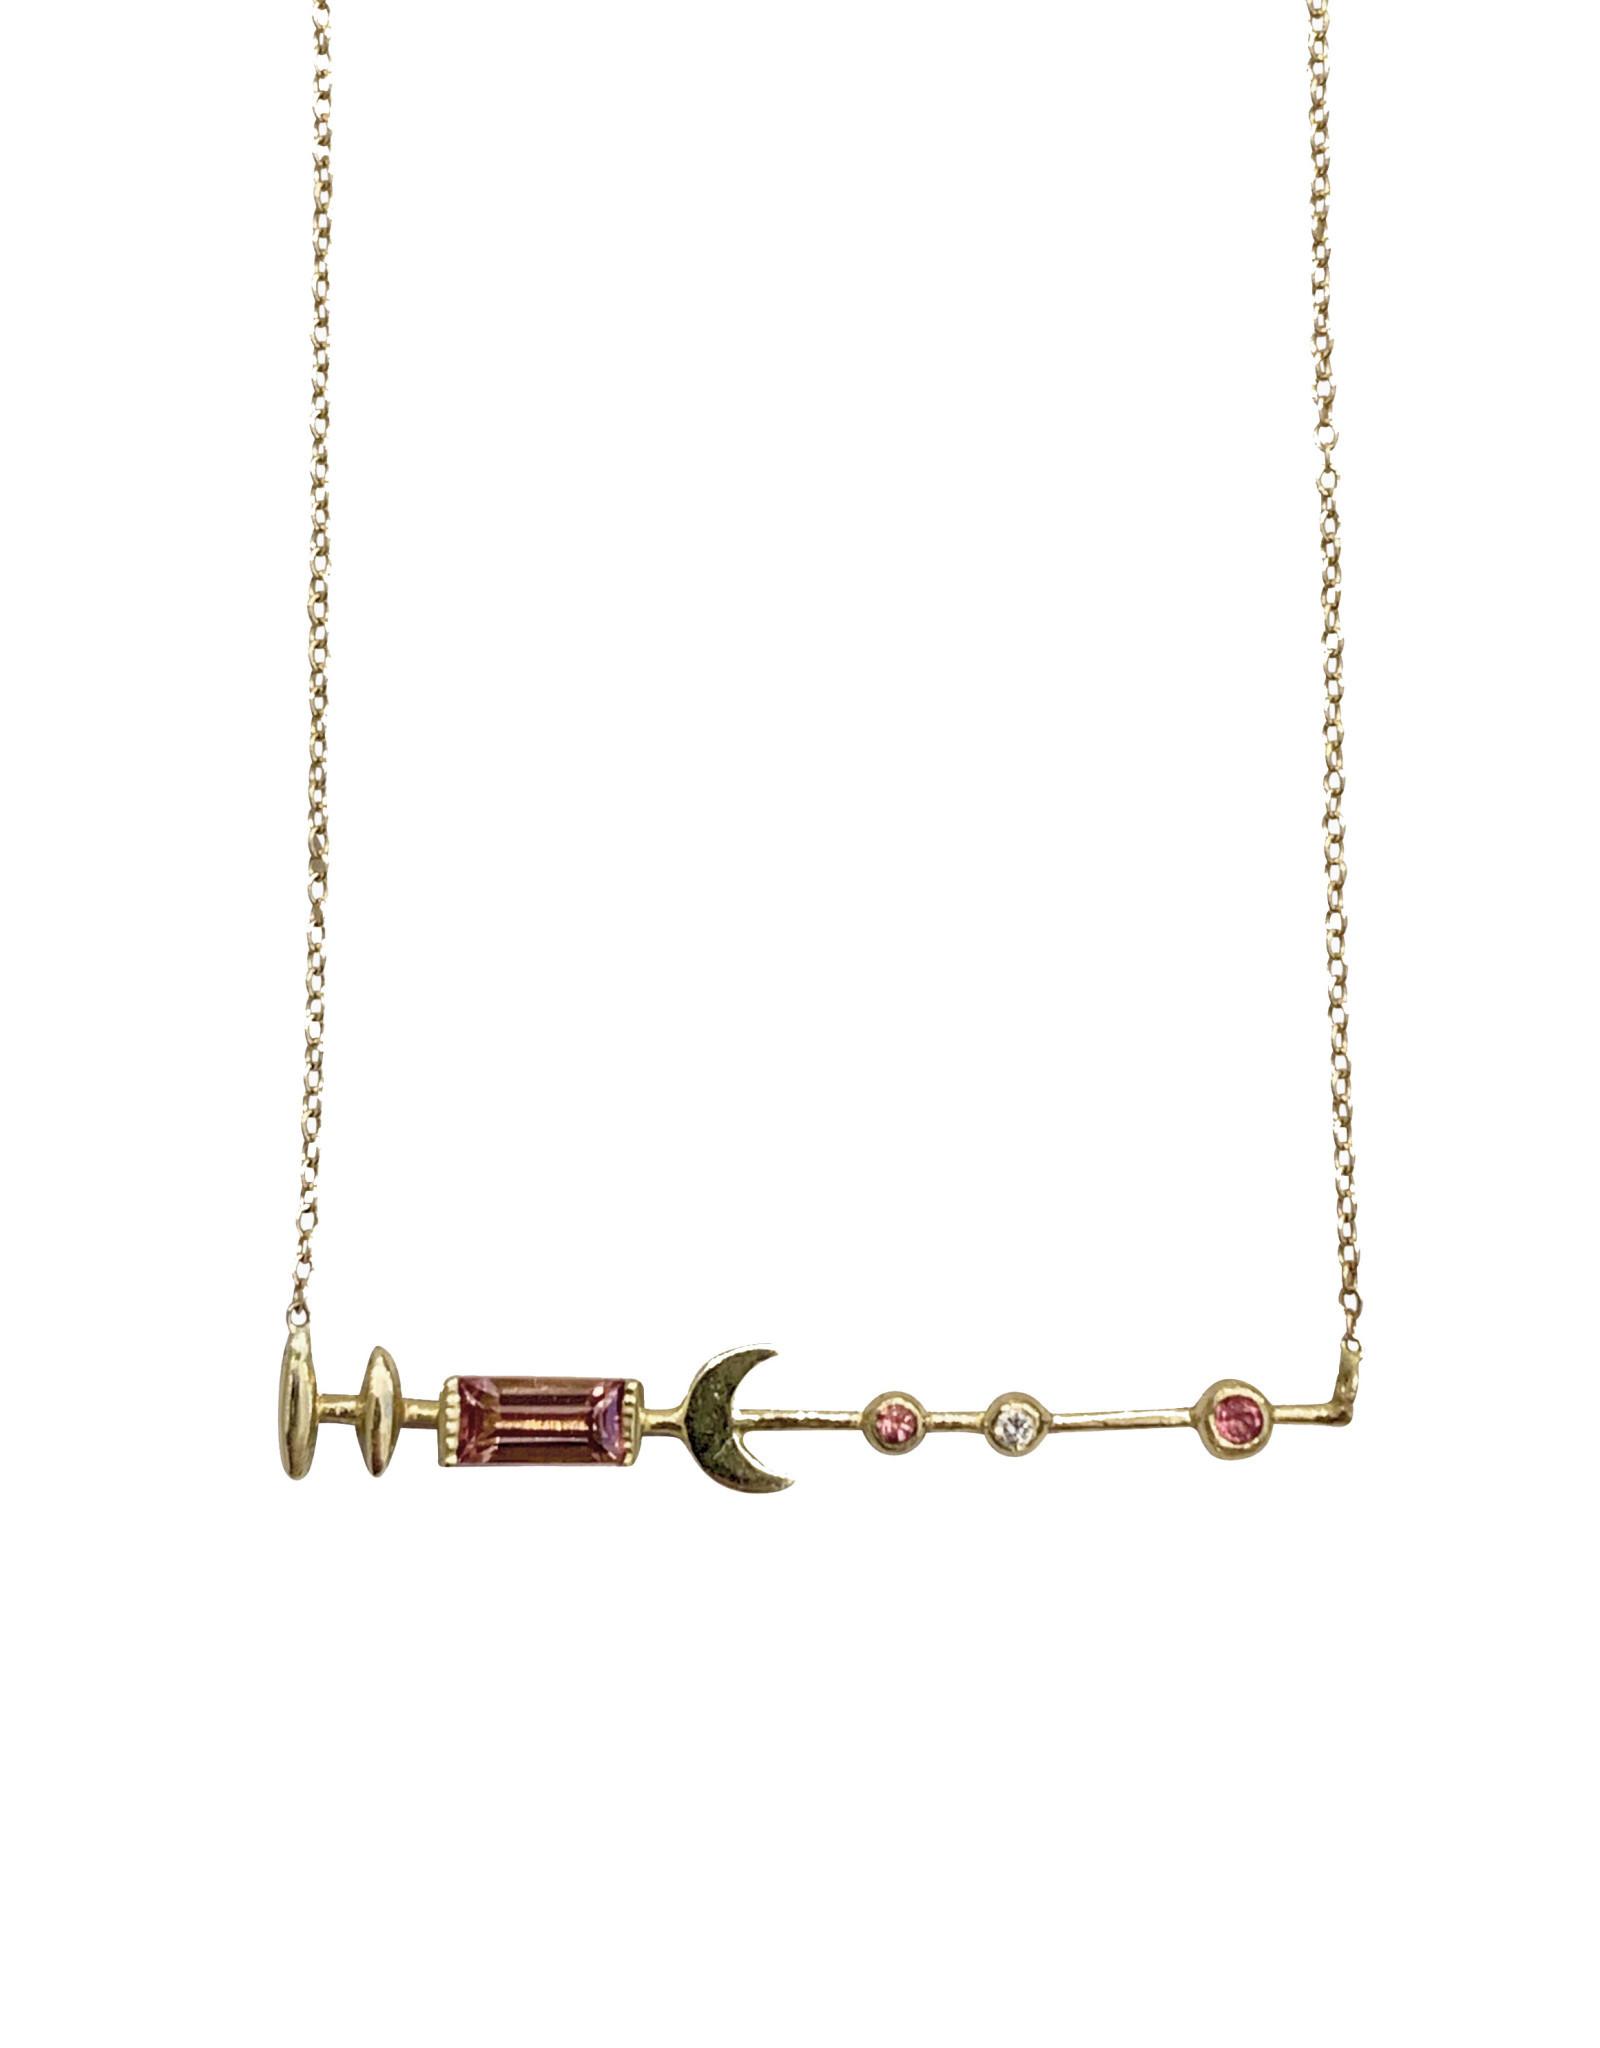 Lio & Linn Galaxy Necklace